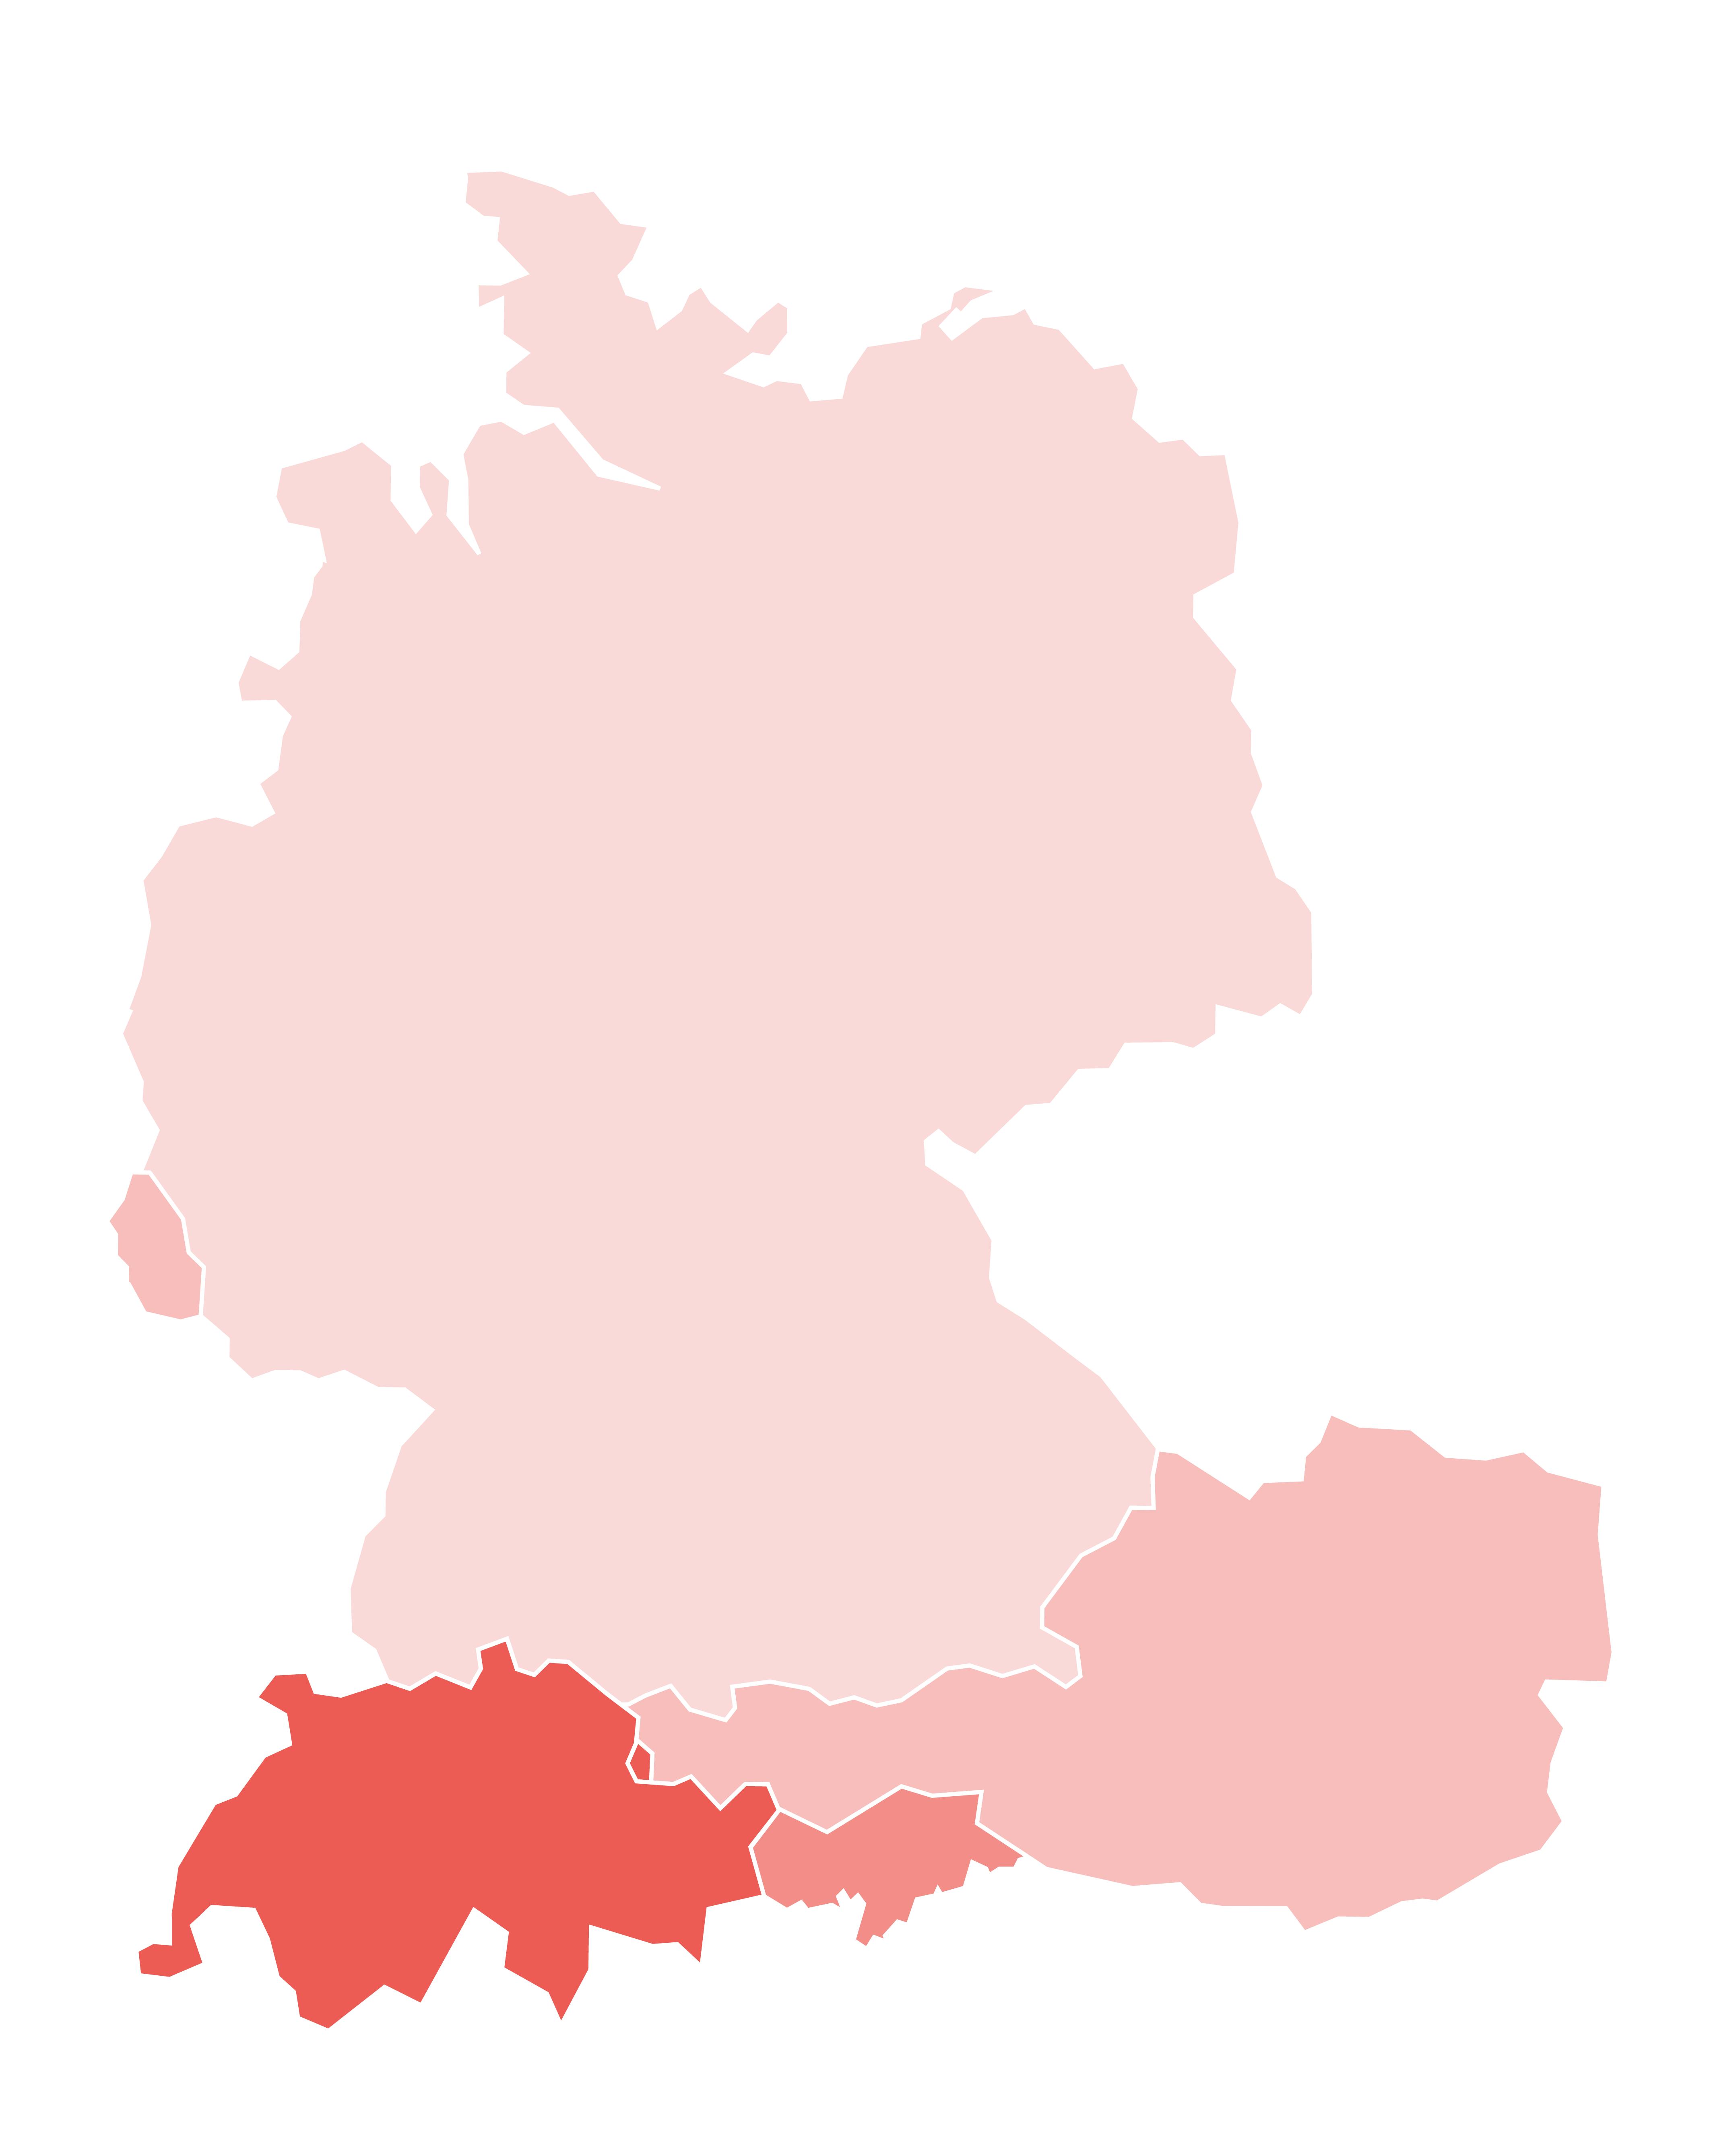 Nova Find - Marktführer in Europa